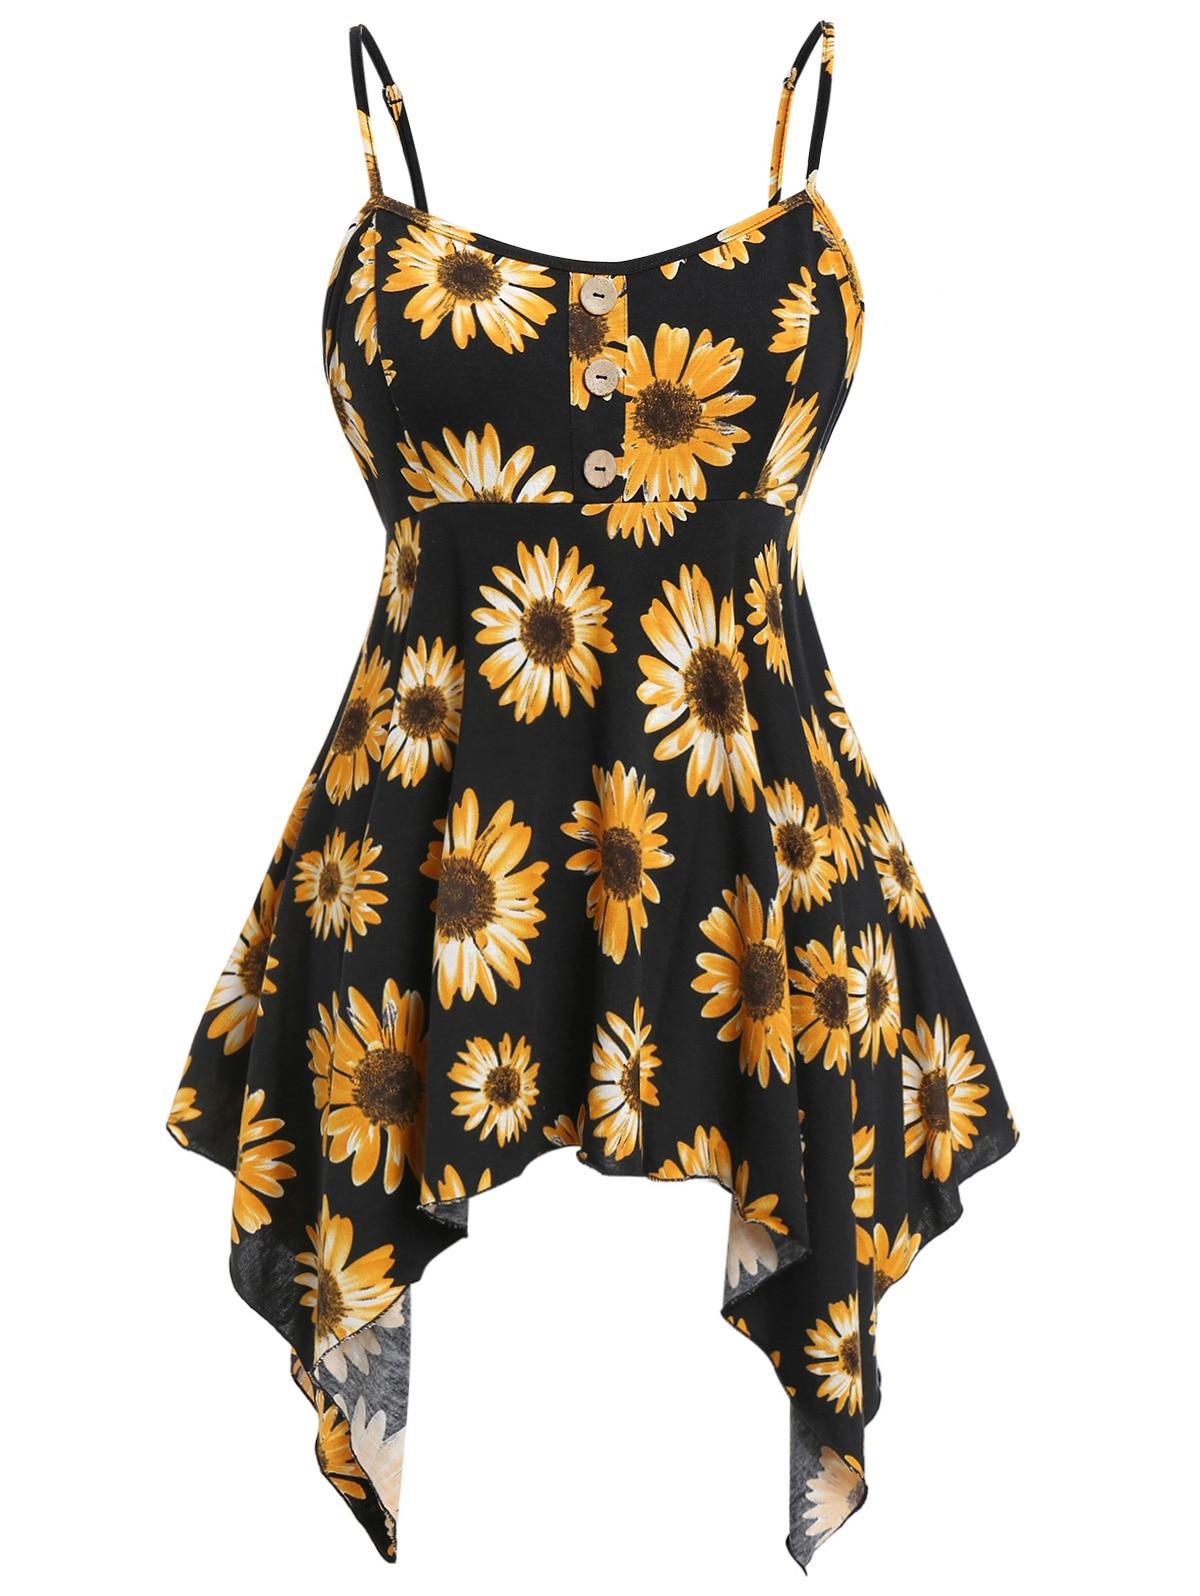 Wipalo Plus Size Printed Cami Asymmetrical Tank Top Sunflower Print Tank Top Printed Ladies Bandage Slim Vest 5XL